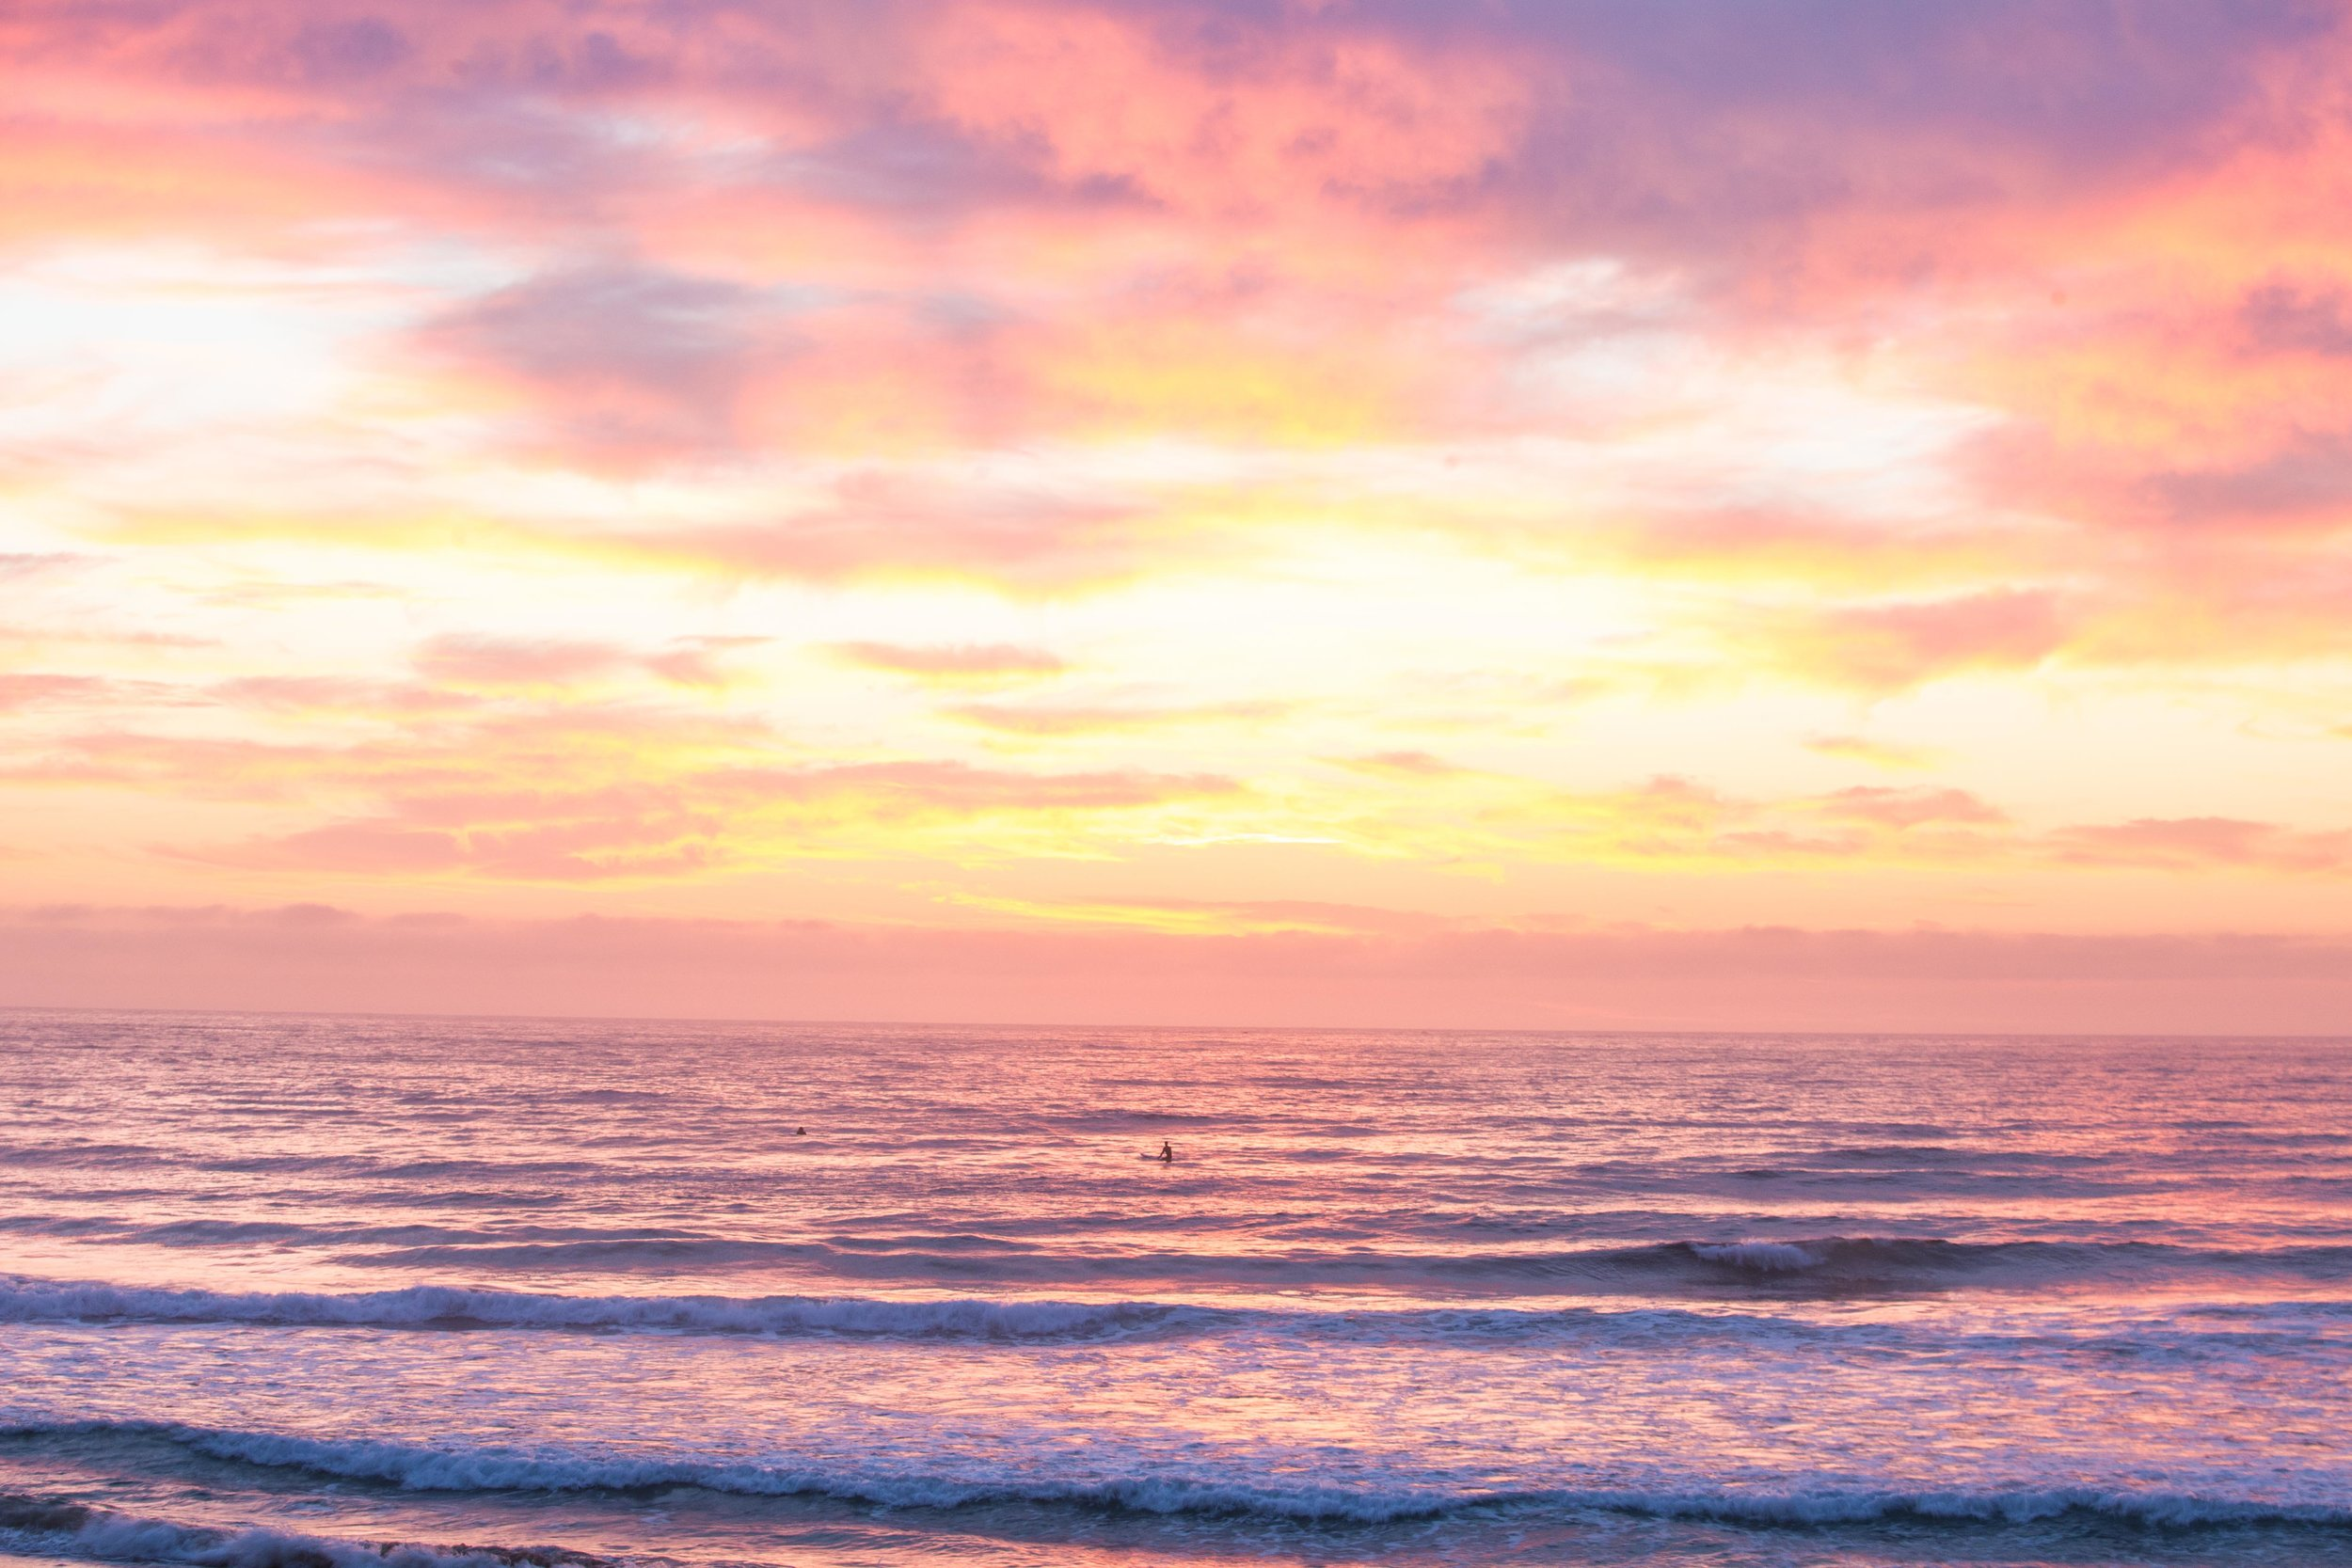 Pink sunrise in Manly beach. Photo: Marine Raynard